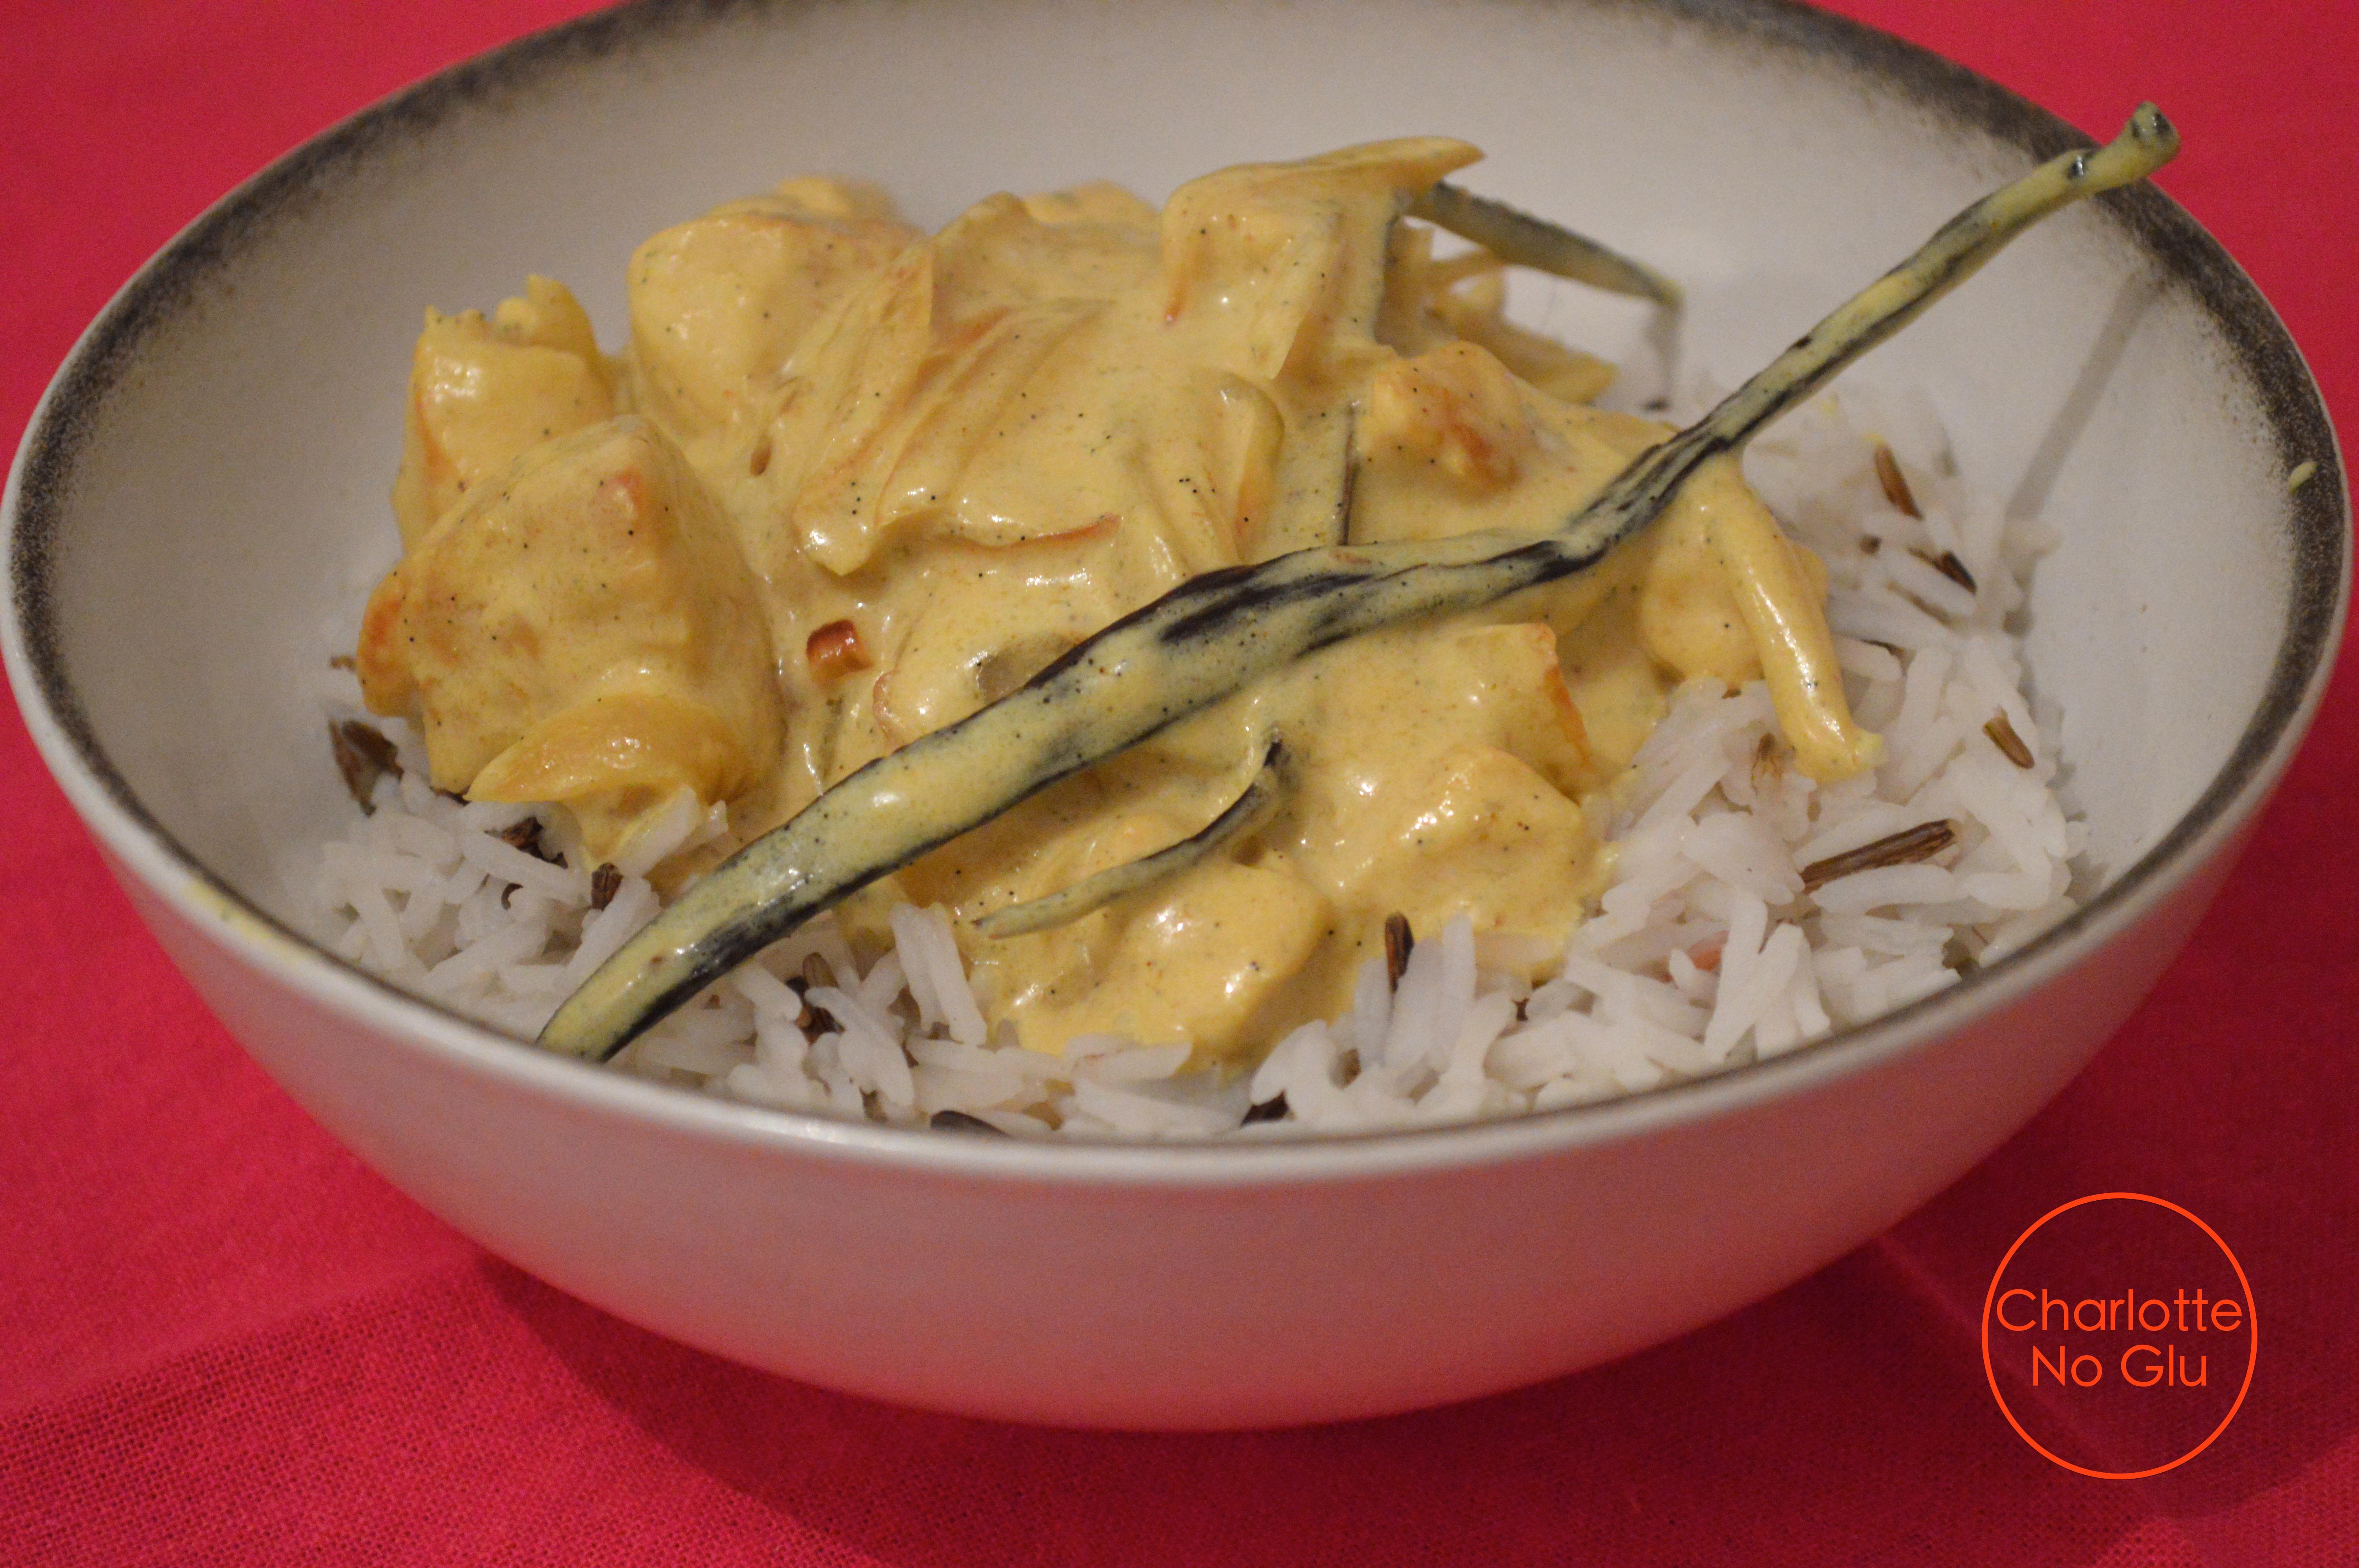 Poulet vanille coco coconut and vanilla chicken dis - Recette laurent mariotte aujourd hui ...